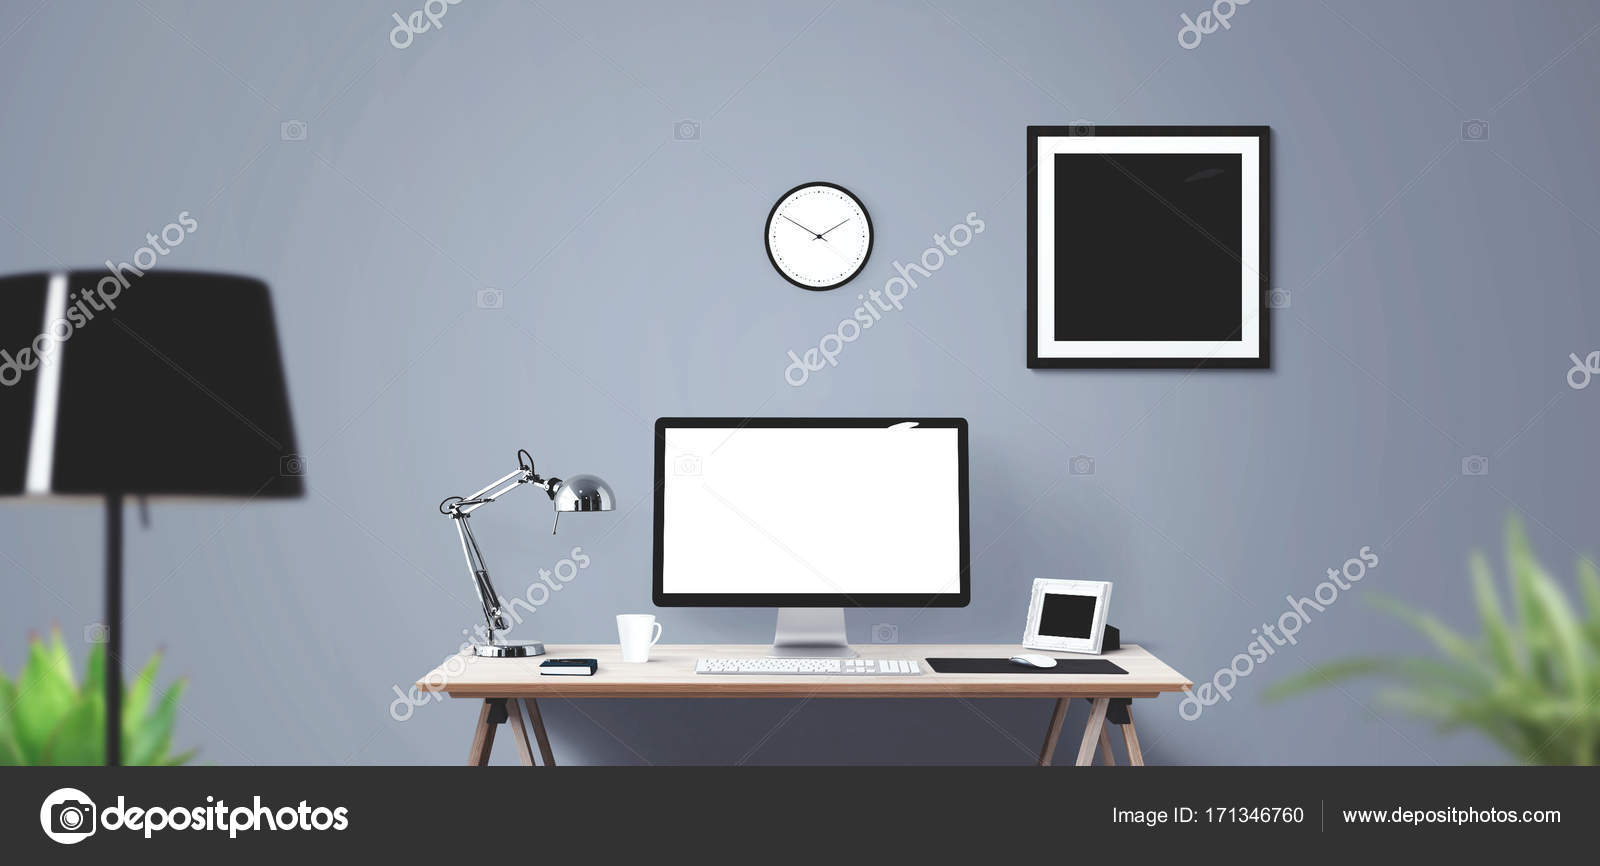 Desk Desktop Frame Front Home Interior Lamp Loft Modern Office Pencil Picture Poster Screen Studio Table Watch White Work Workspace